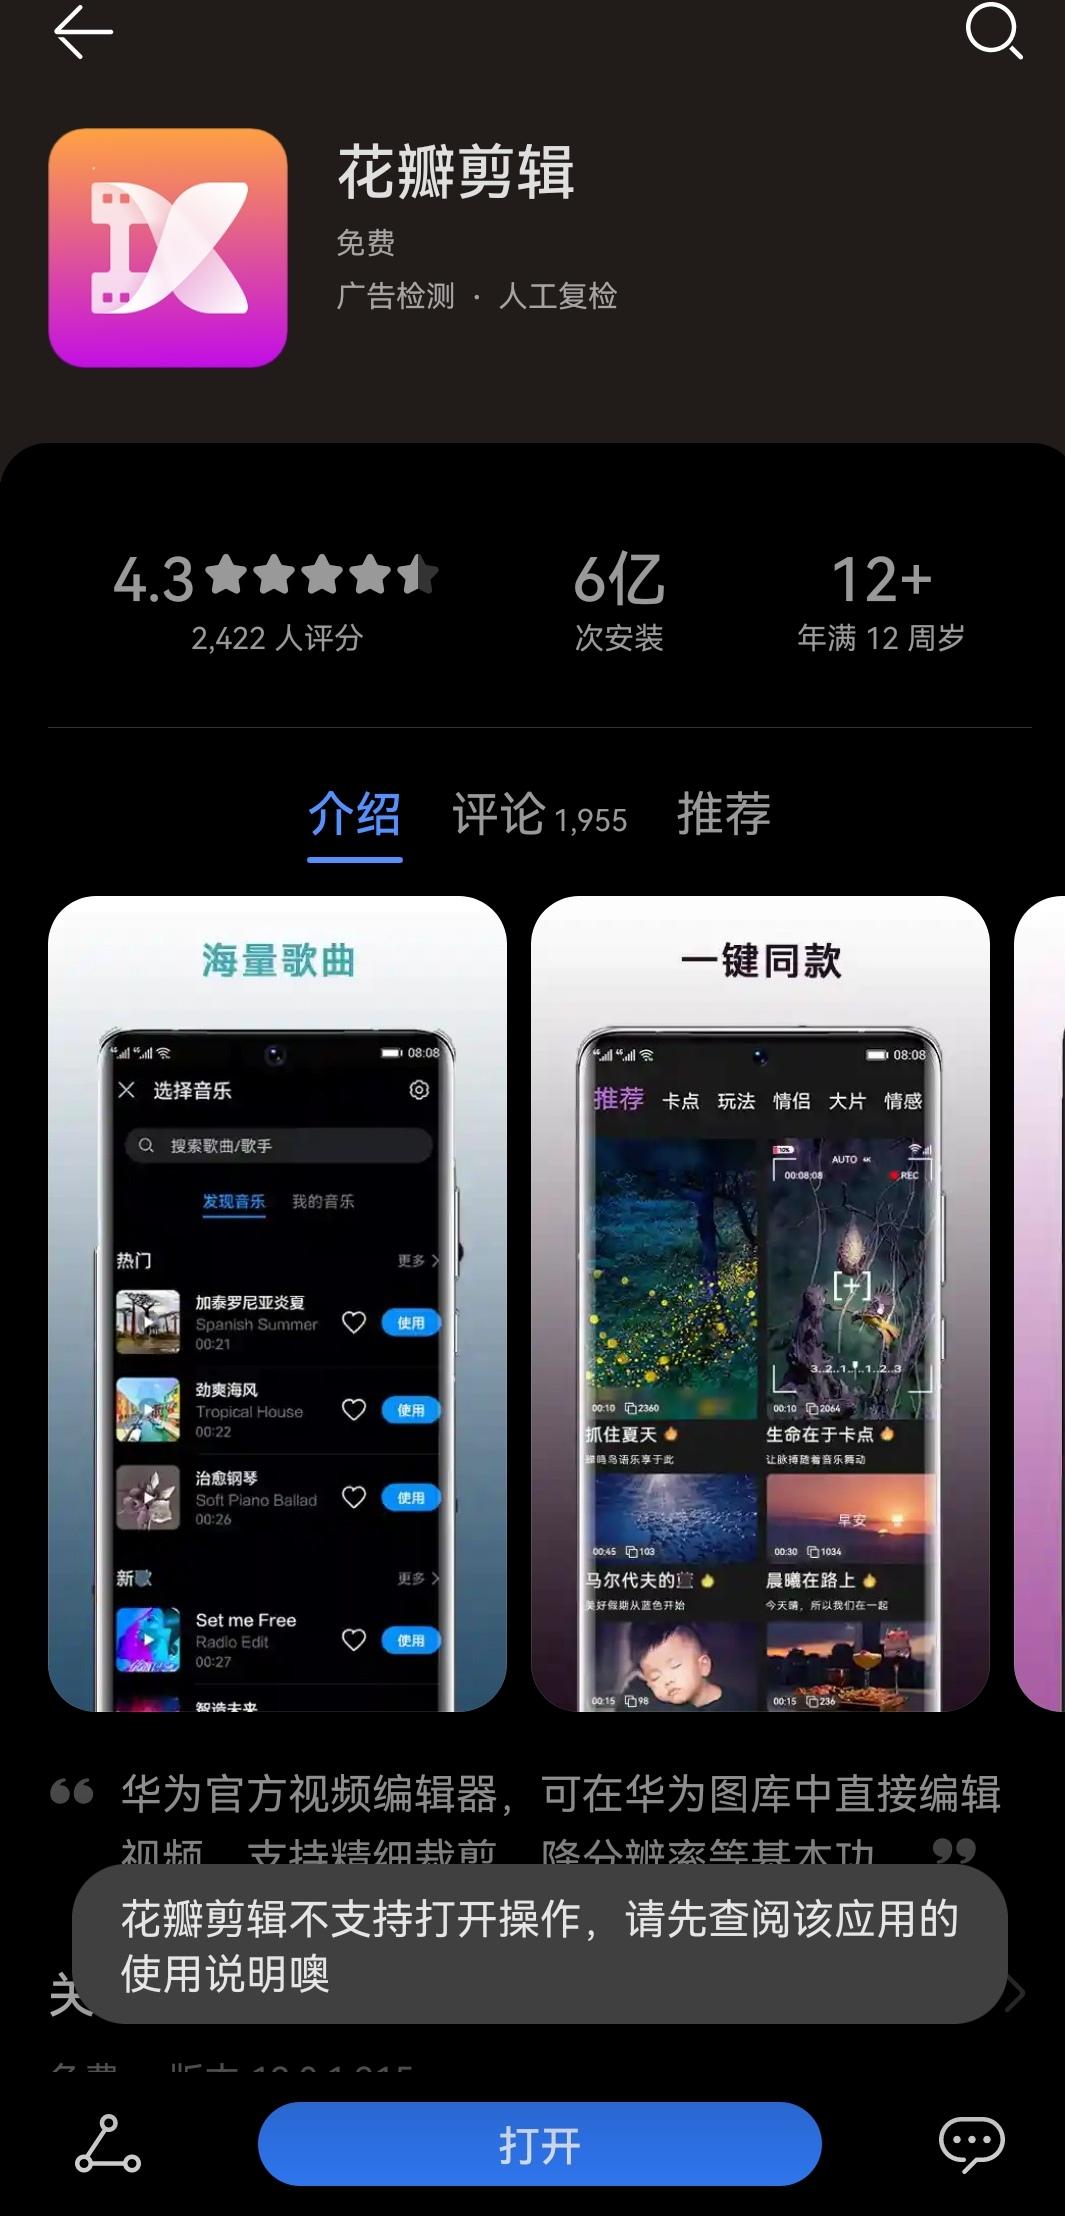 Screenshot_20210823_213039_com.huawei.appmarket_edit_103006542224906.jpg